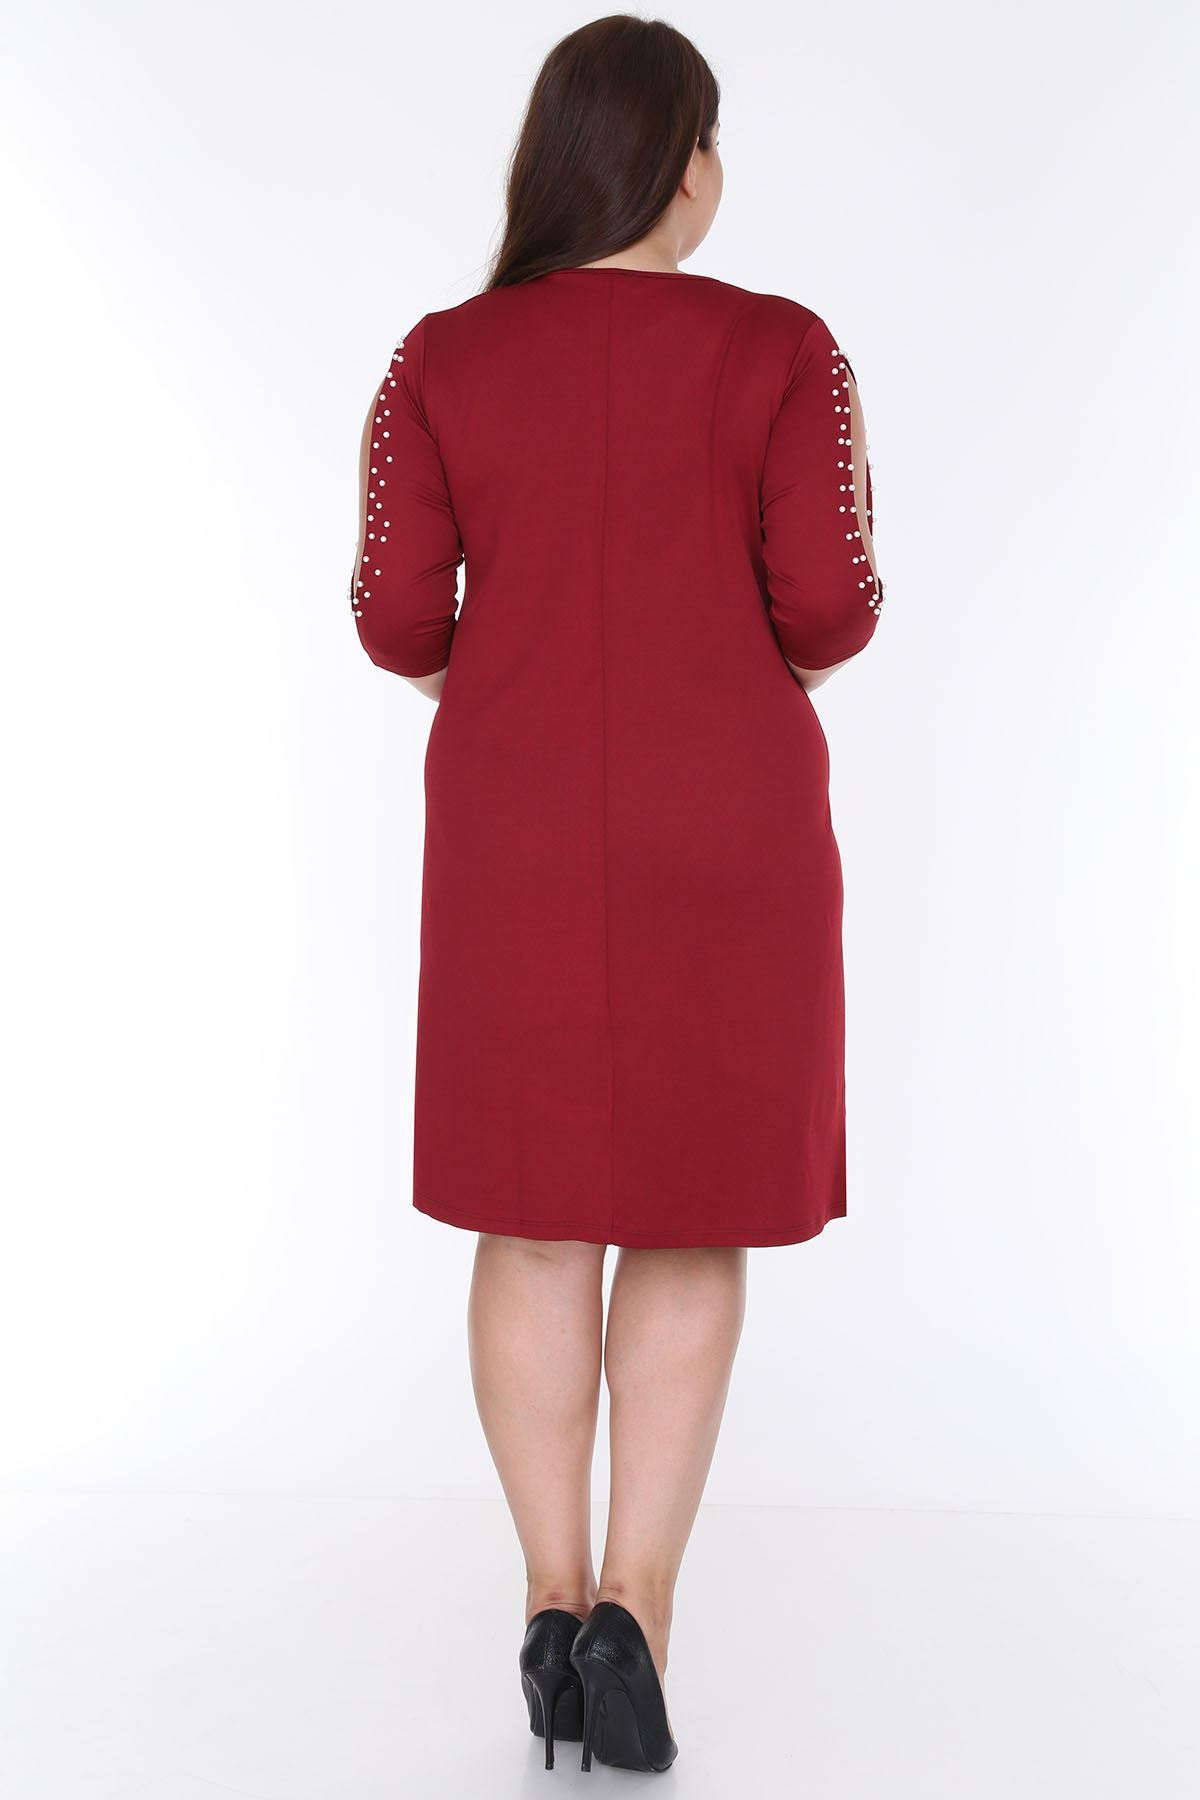 Kol İncili Bordo Elbise 21D-0608